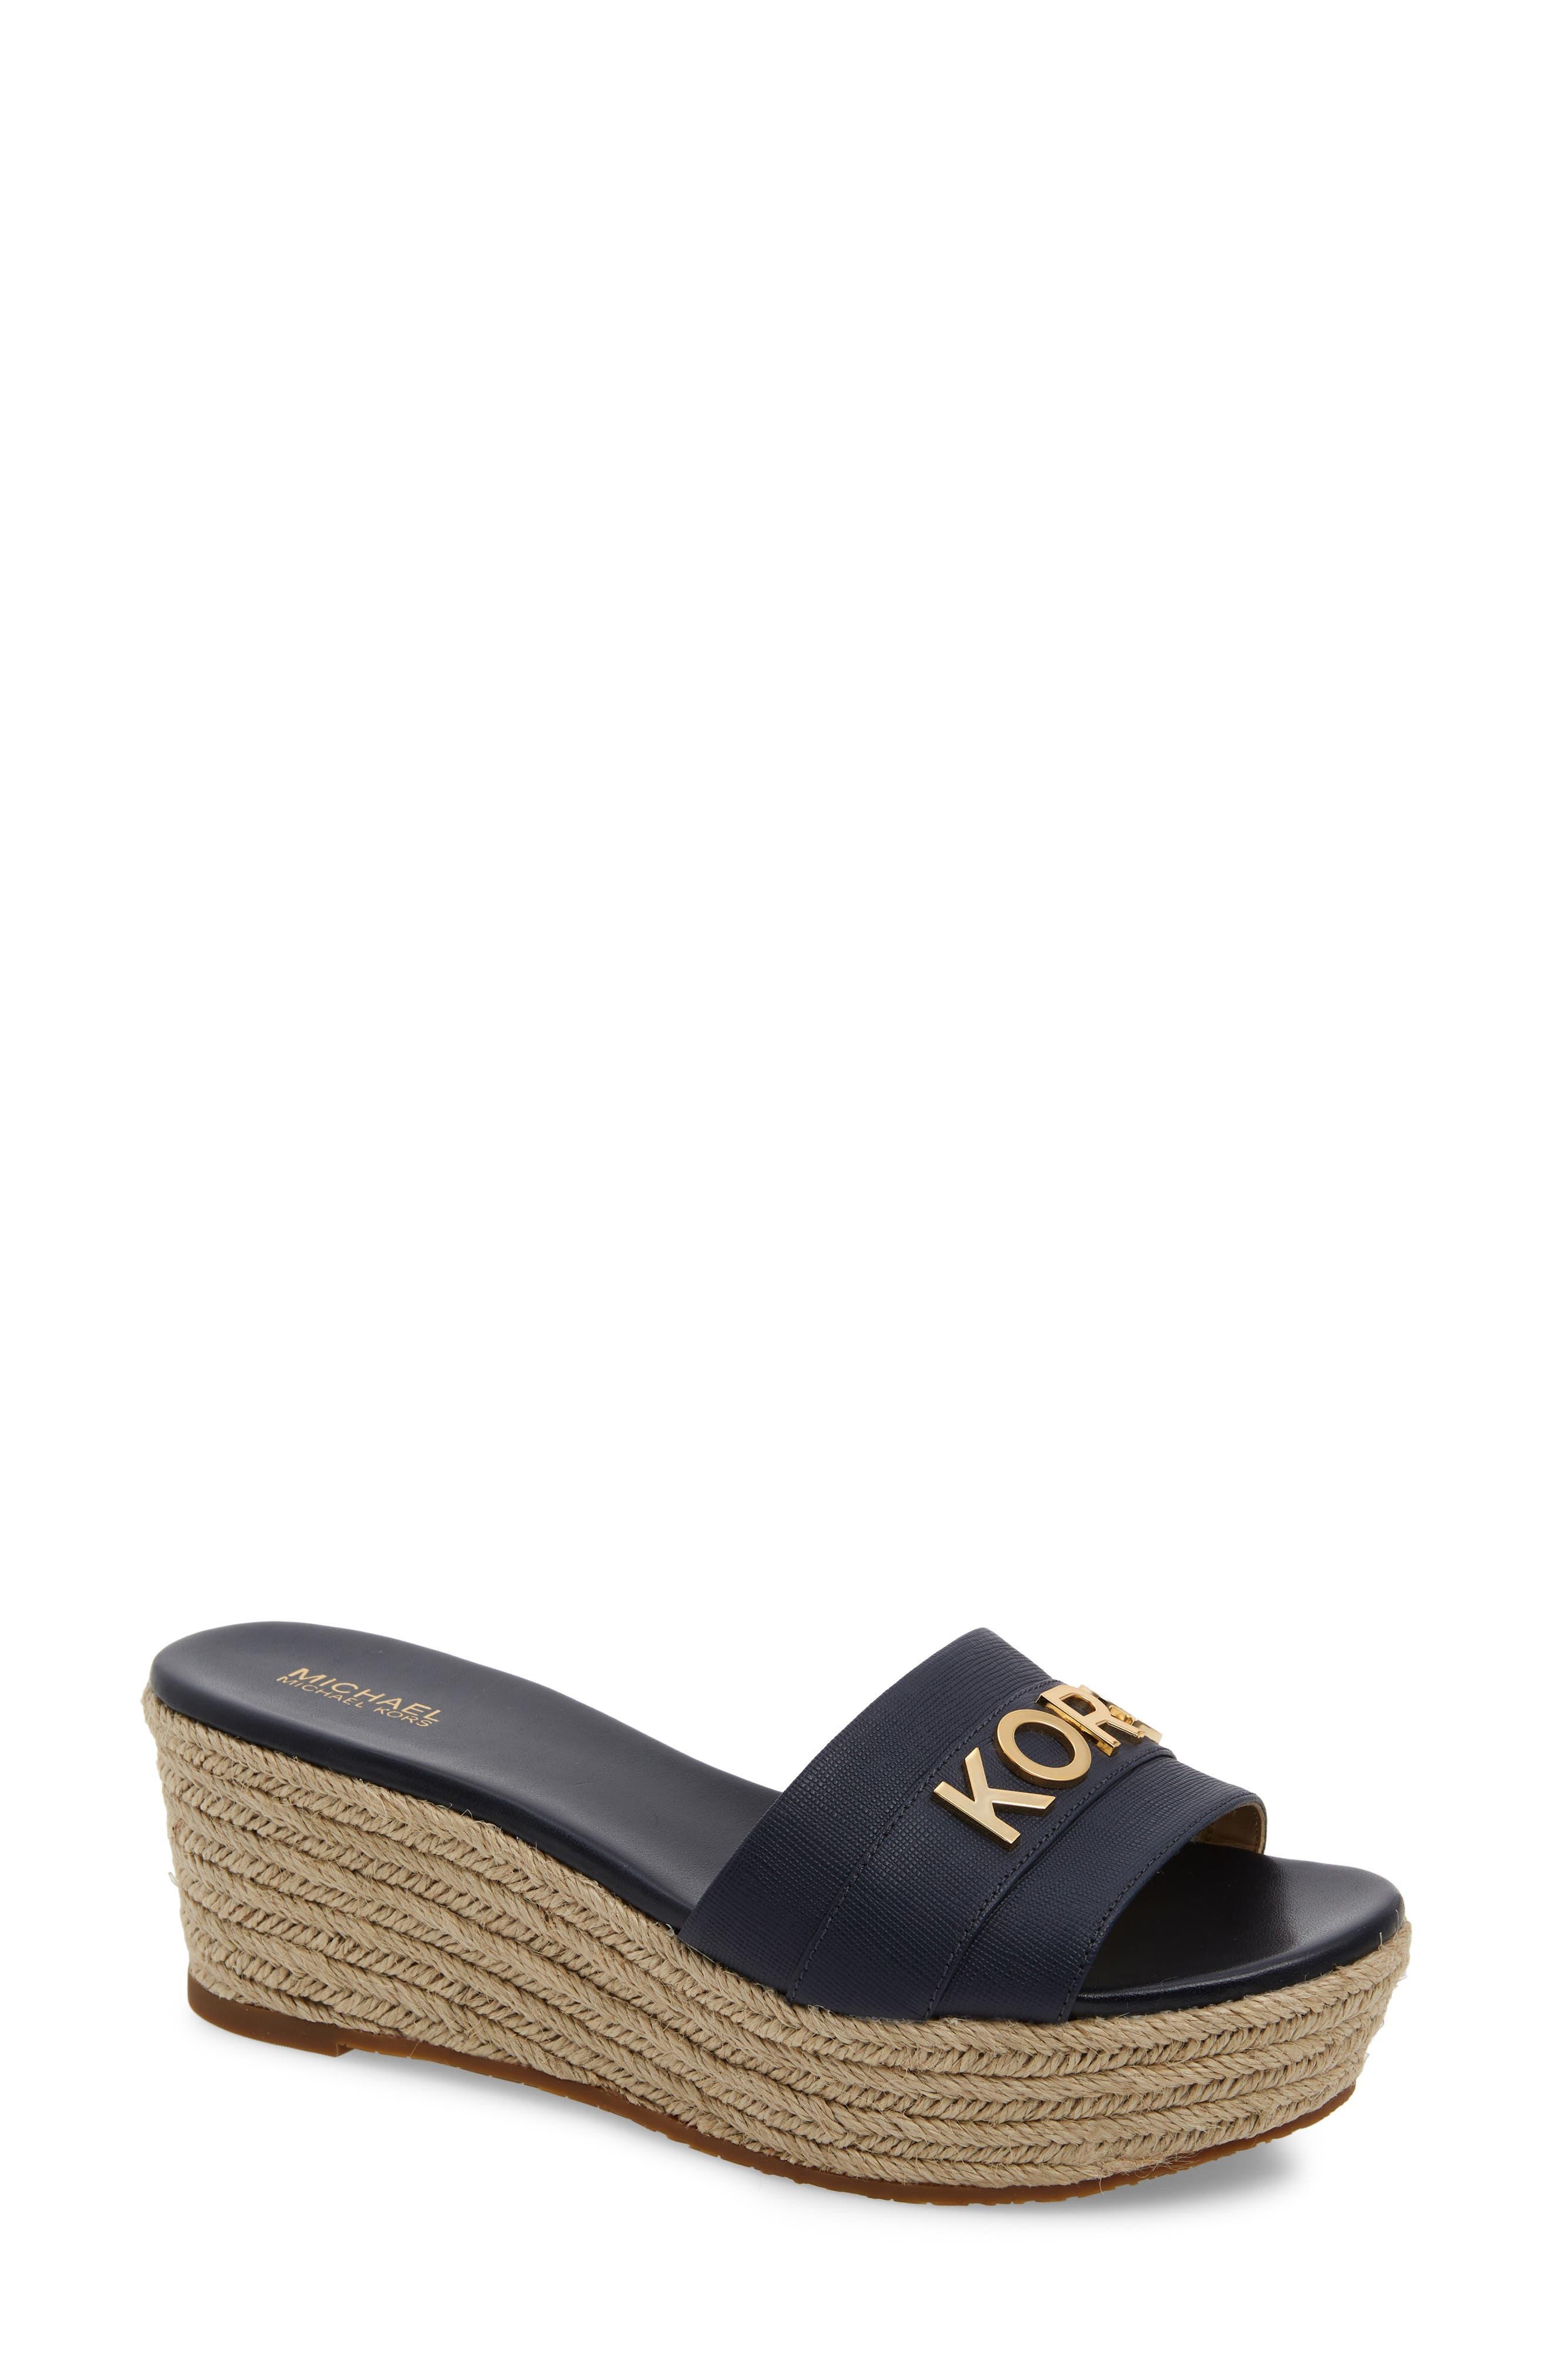 MICHAEL MICHAEL KORS Brady Platform Slide Sandal, Main, color, ADMIRAL SAFFIANO LEATHER